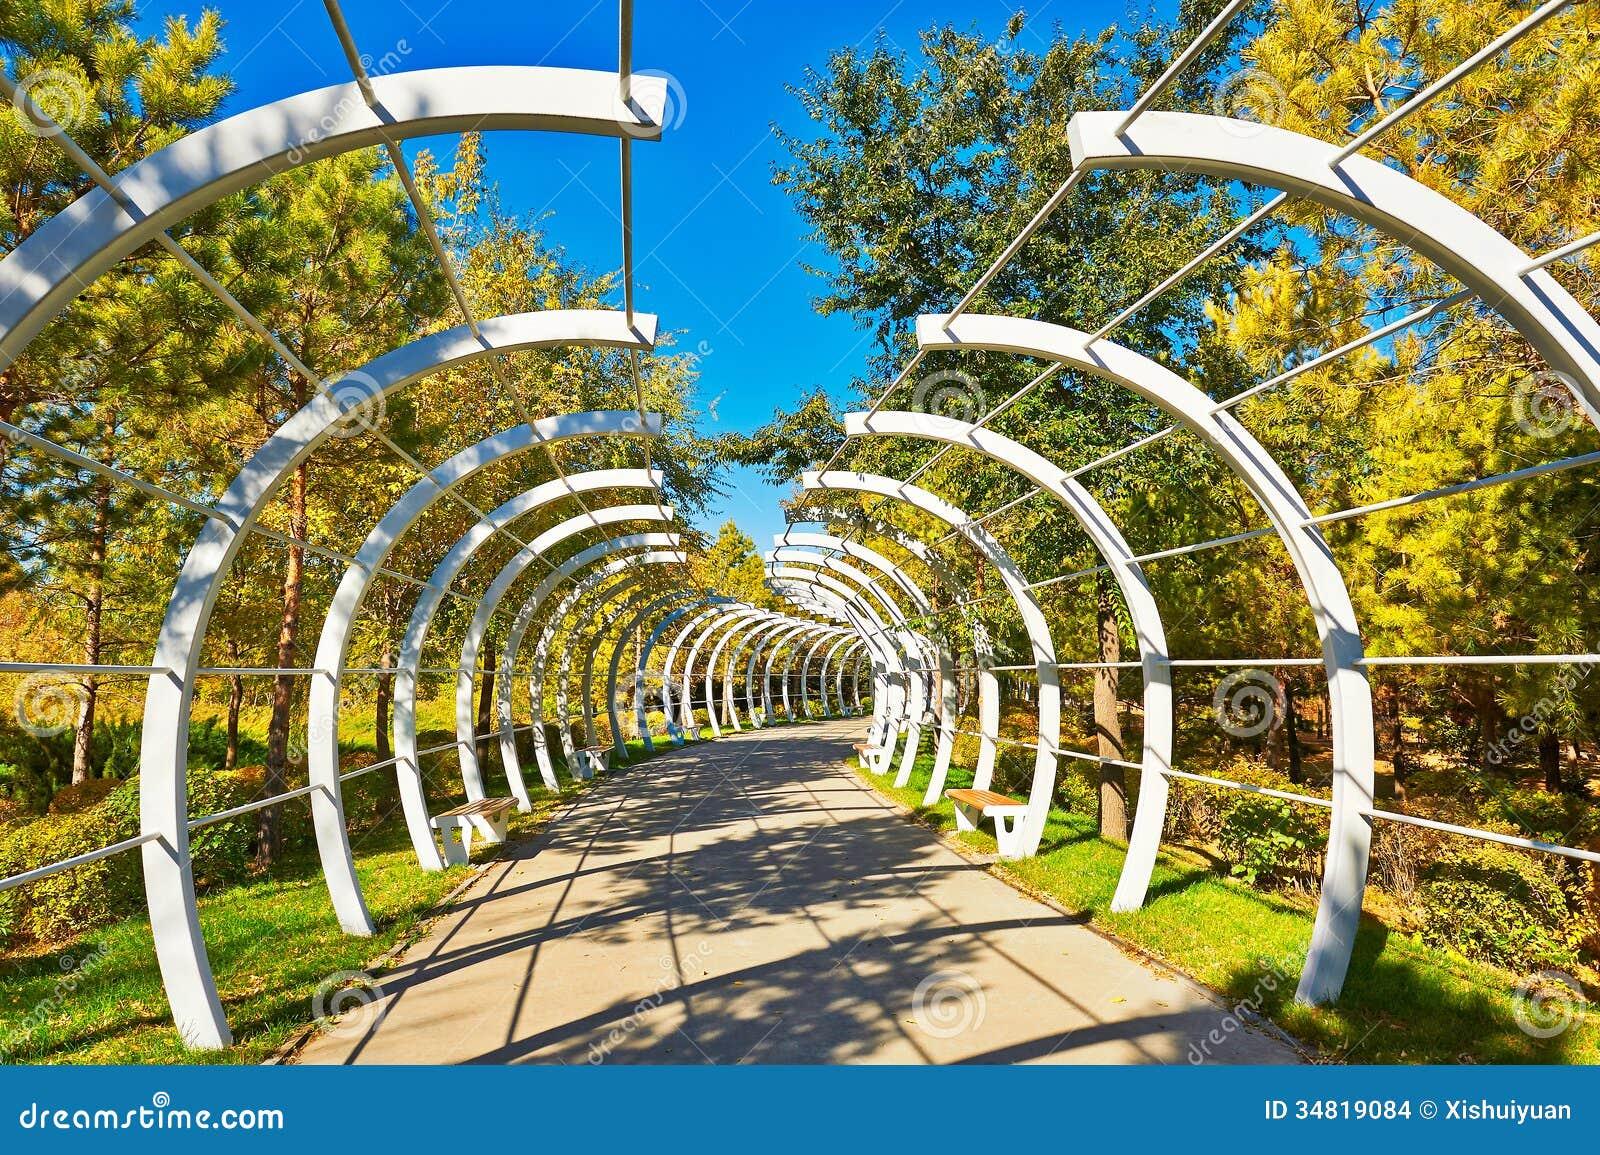 Arc Plank Road Landscape Stock Photo Image Of Love